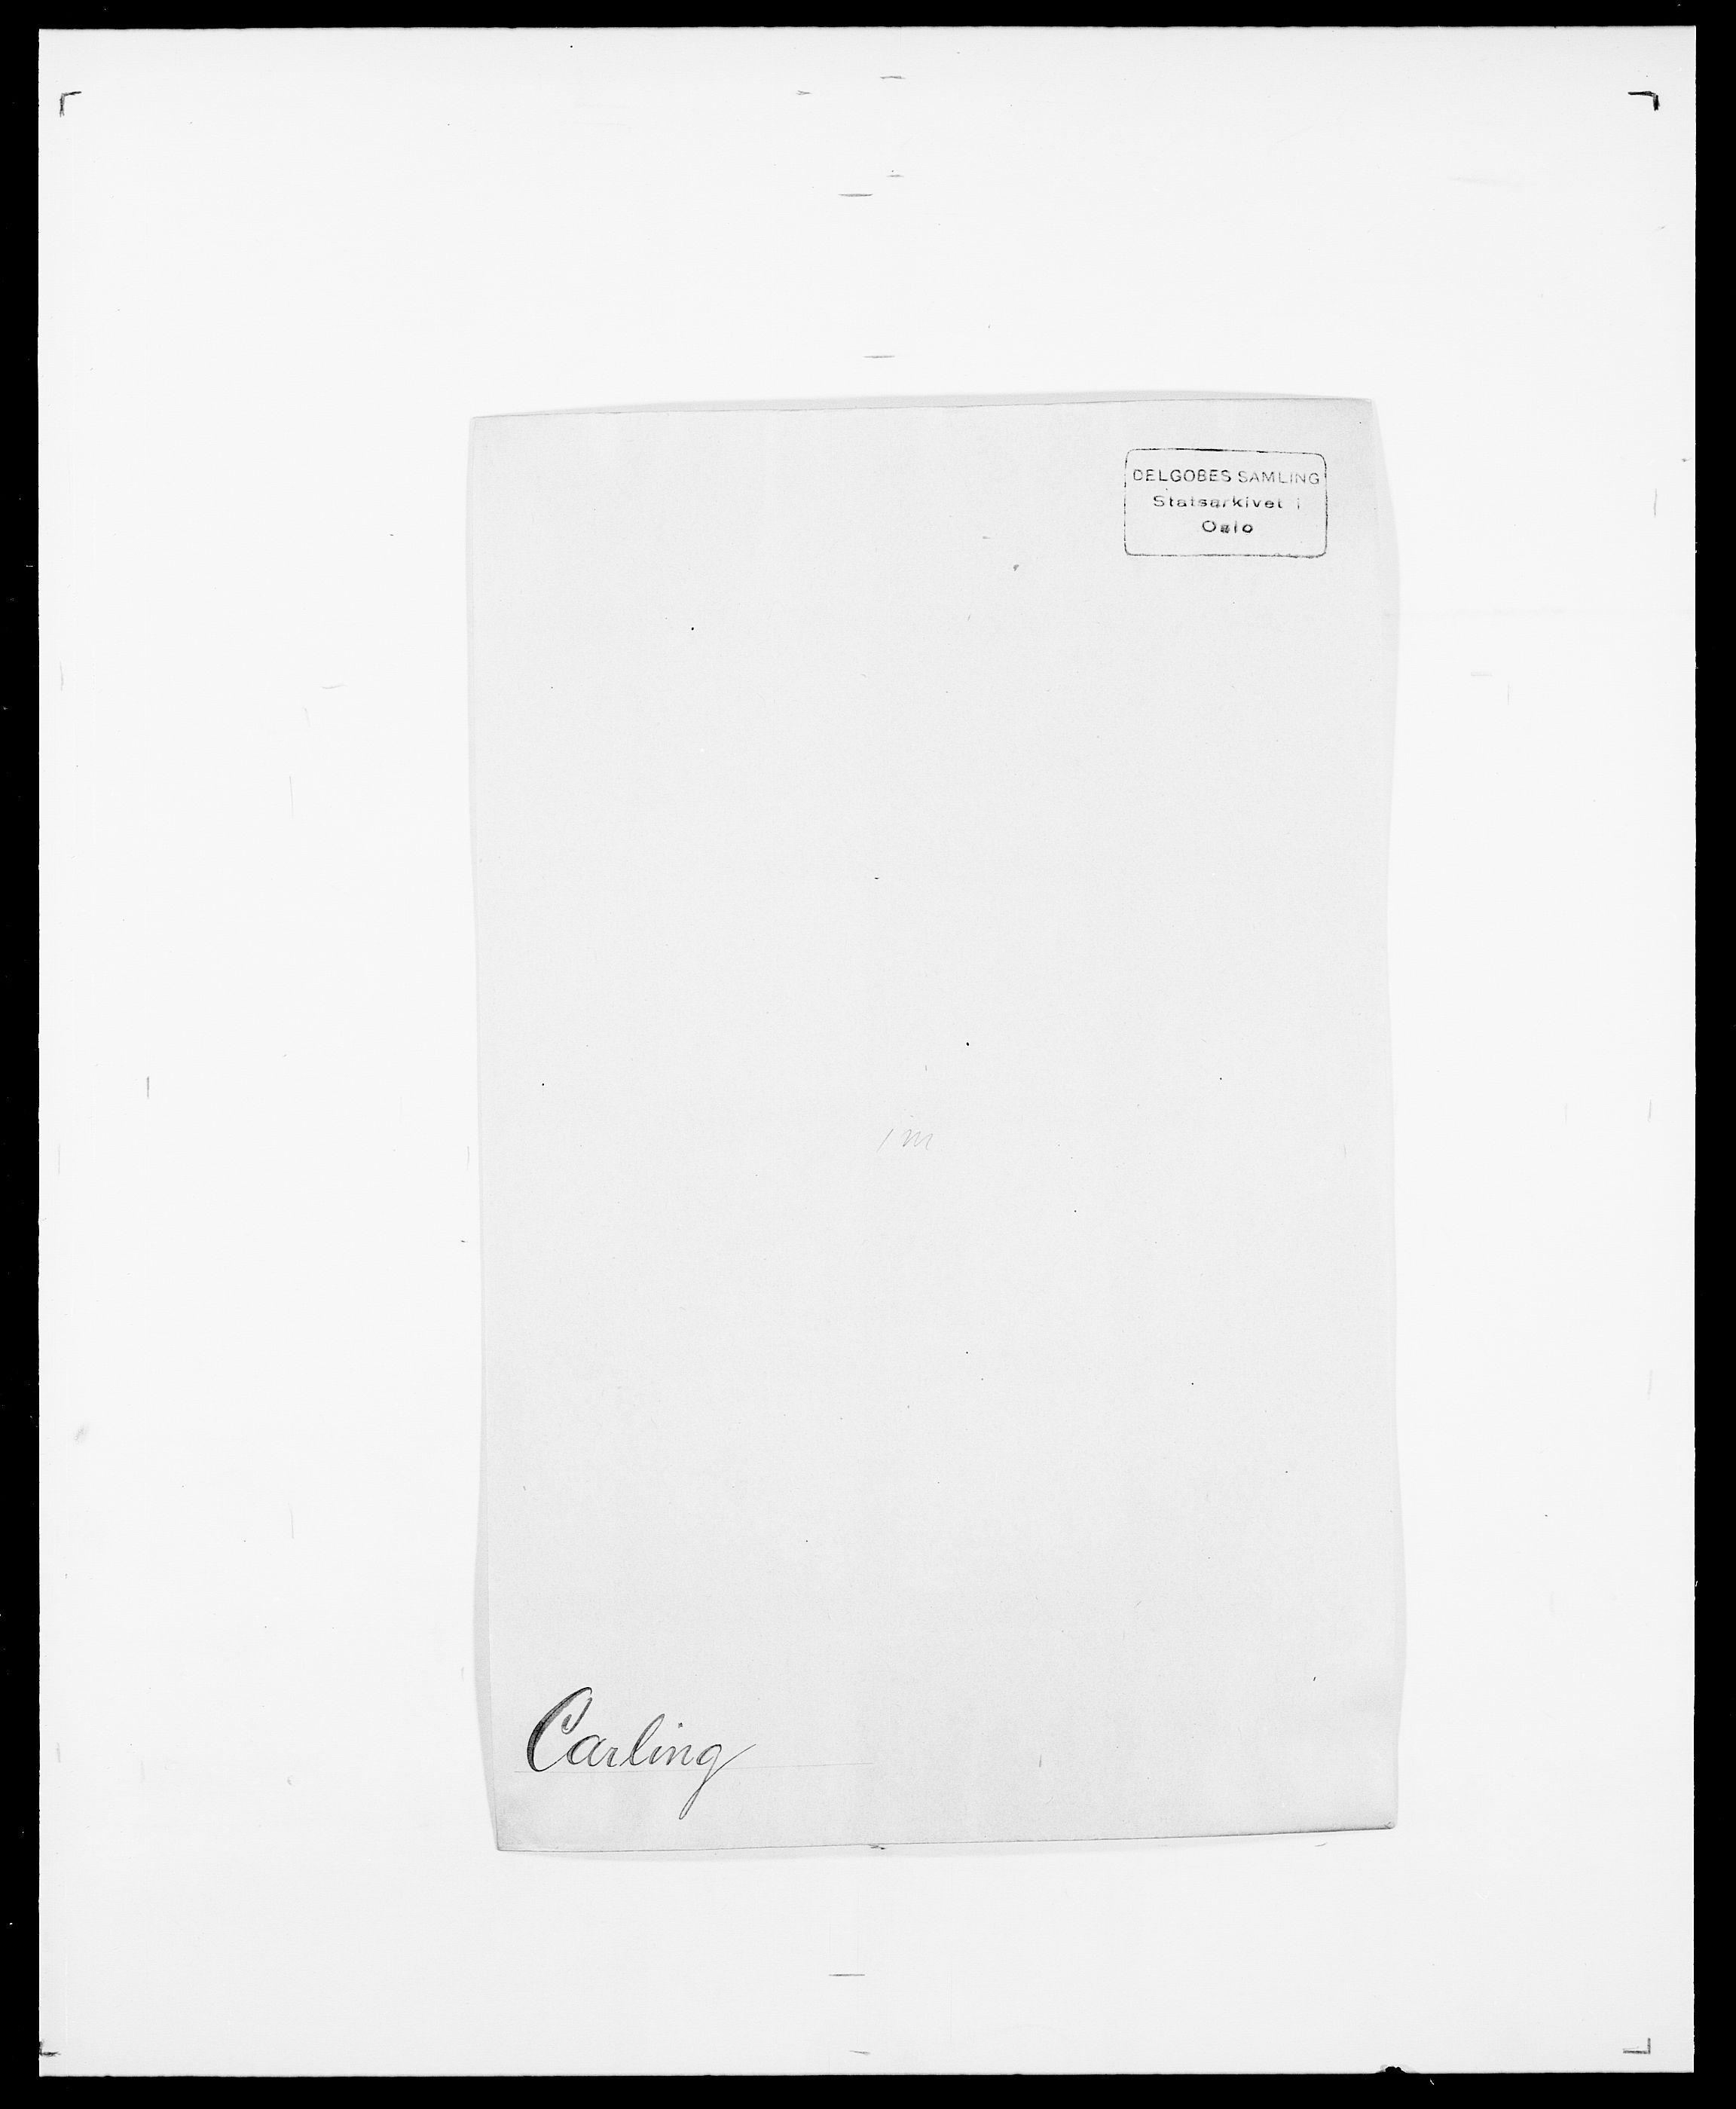 SAO, Delgobe, Charles Antoine - samling, D/Da/L0008: Capjon - Dagenbolt, s. 45